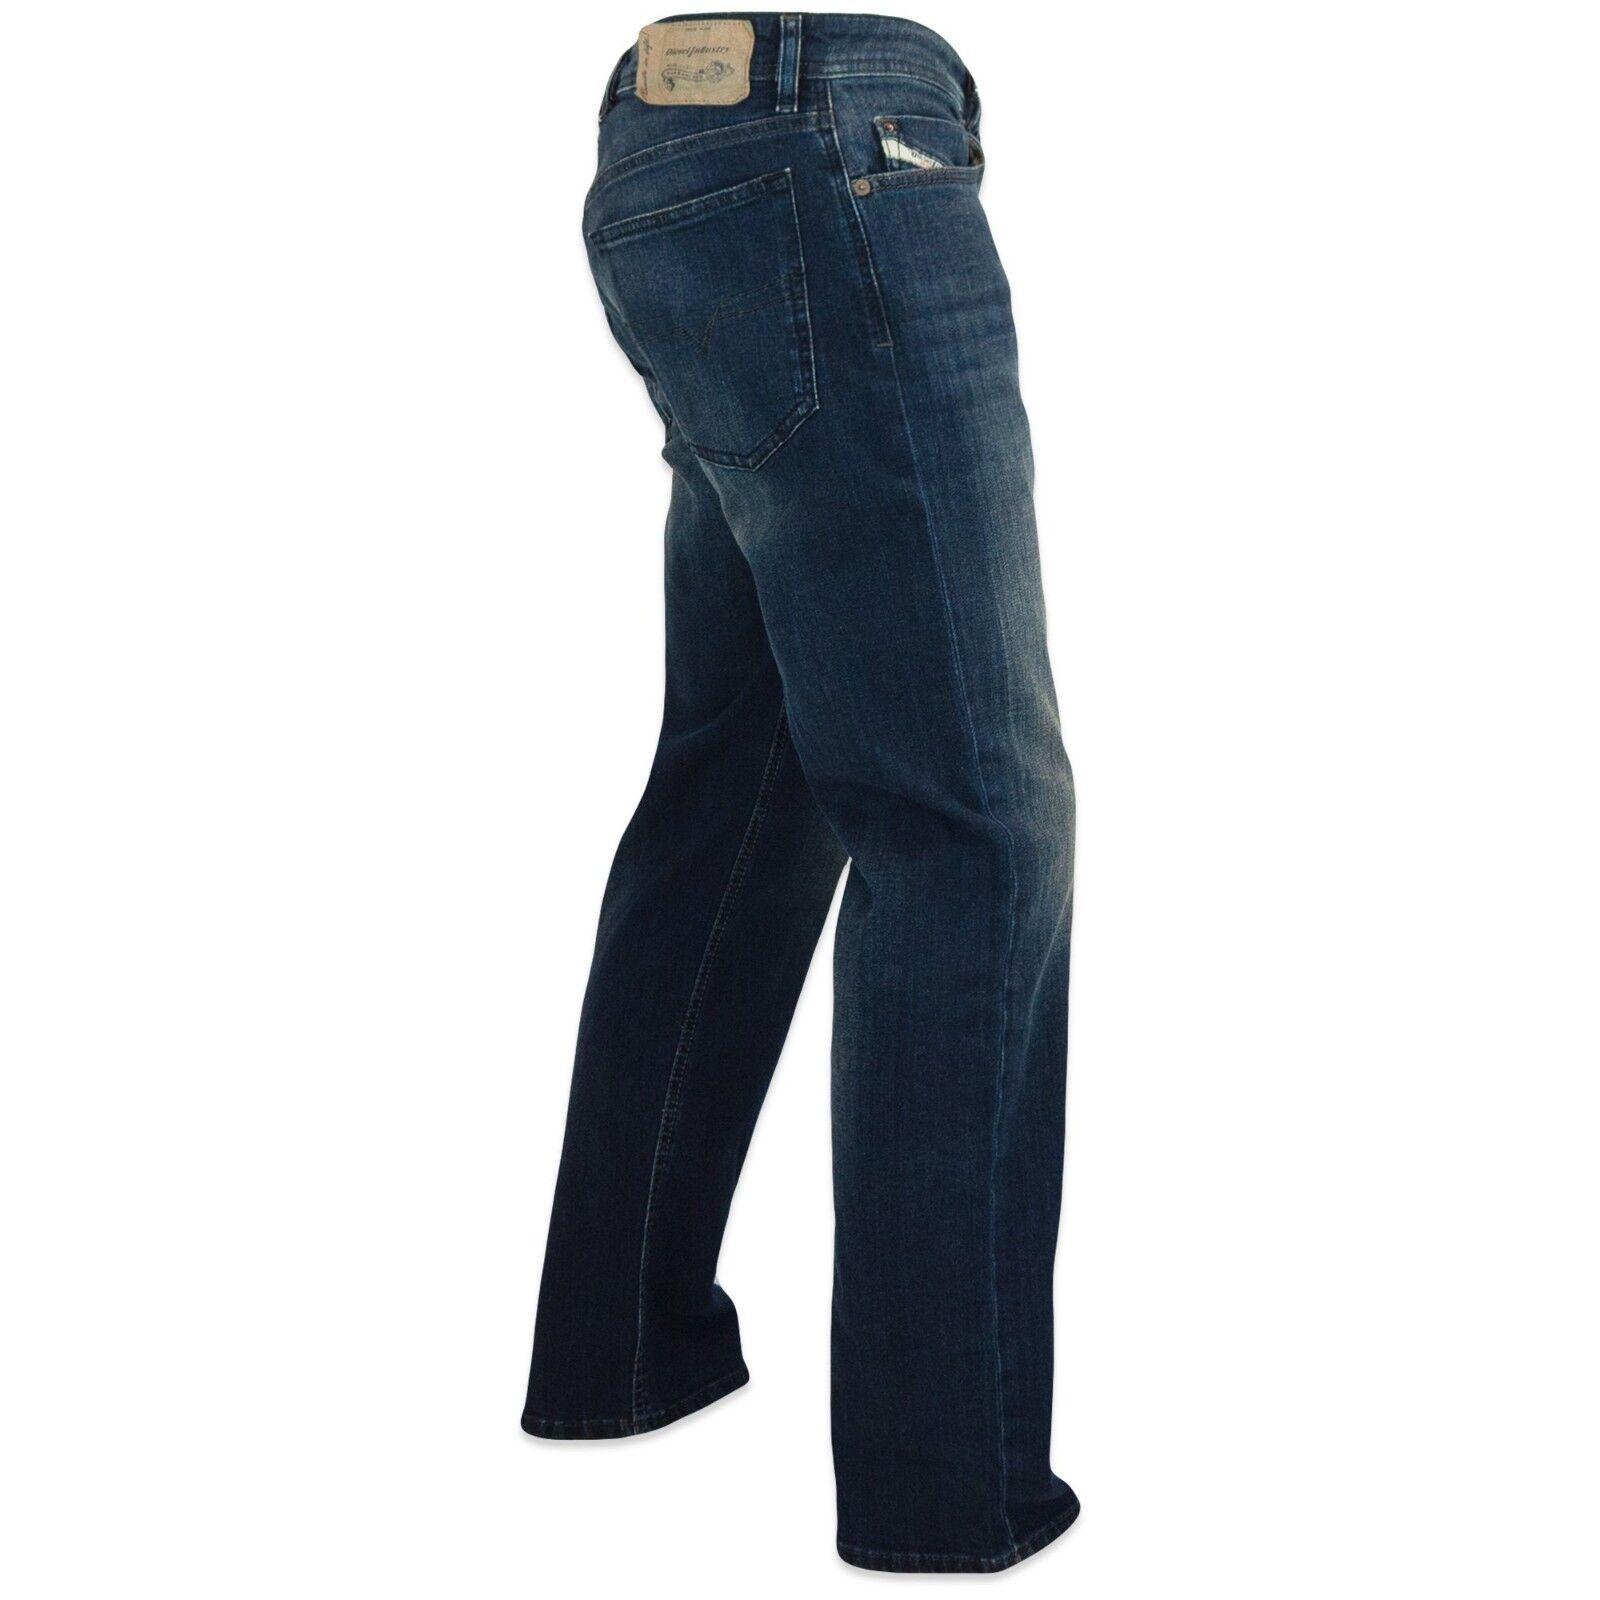 Diesel Jeans - Uomo Waykee Vestibilità Regolare - 0814W - - - Blu Scuro - ec028a